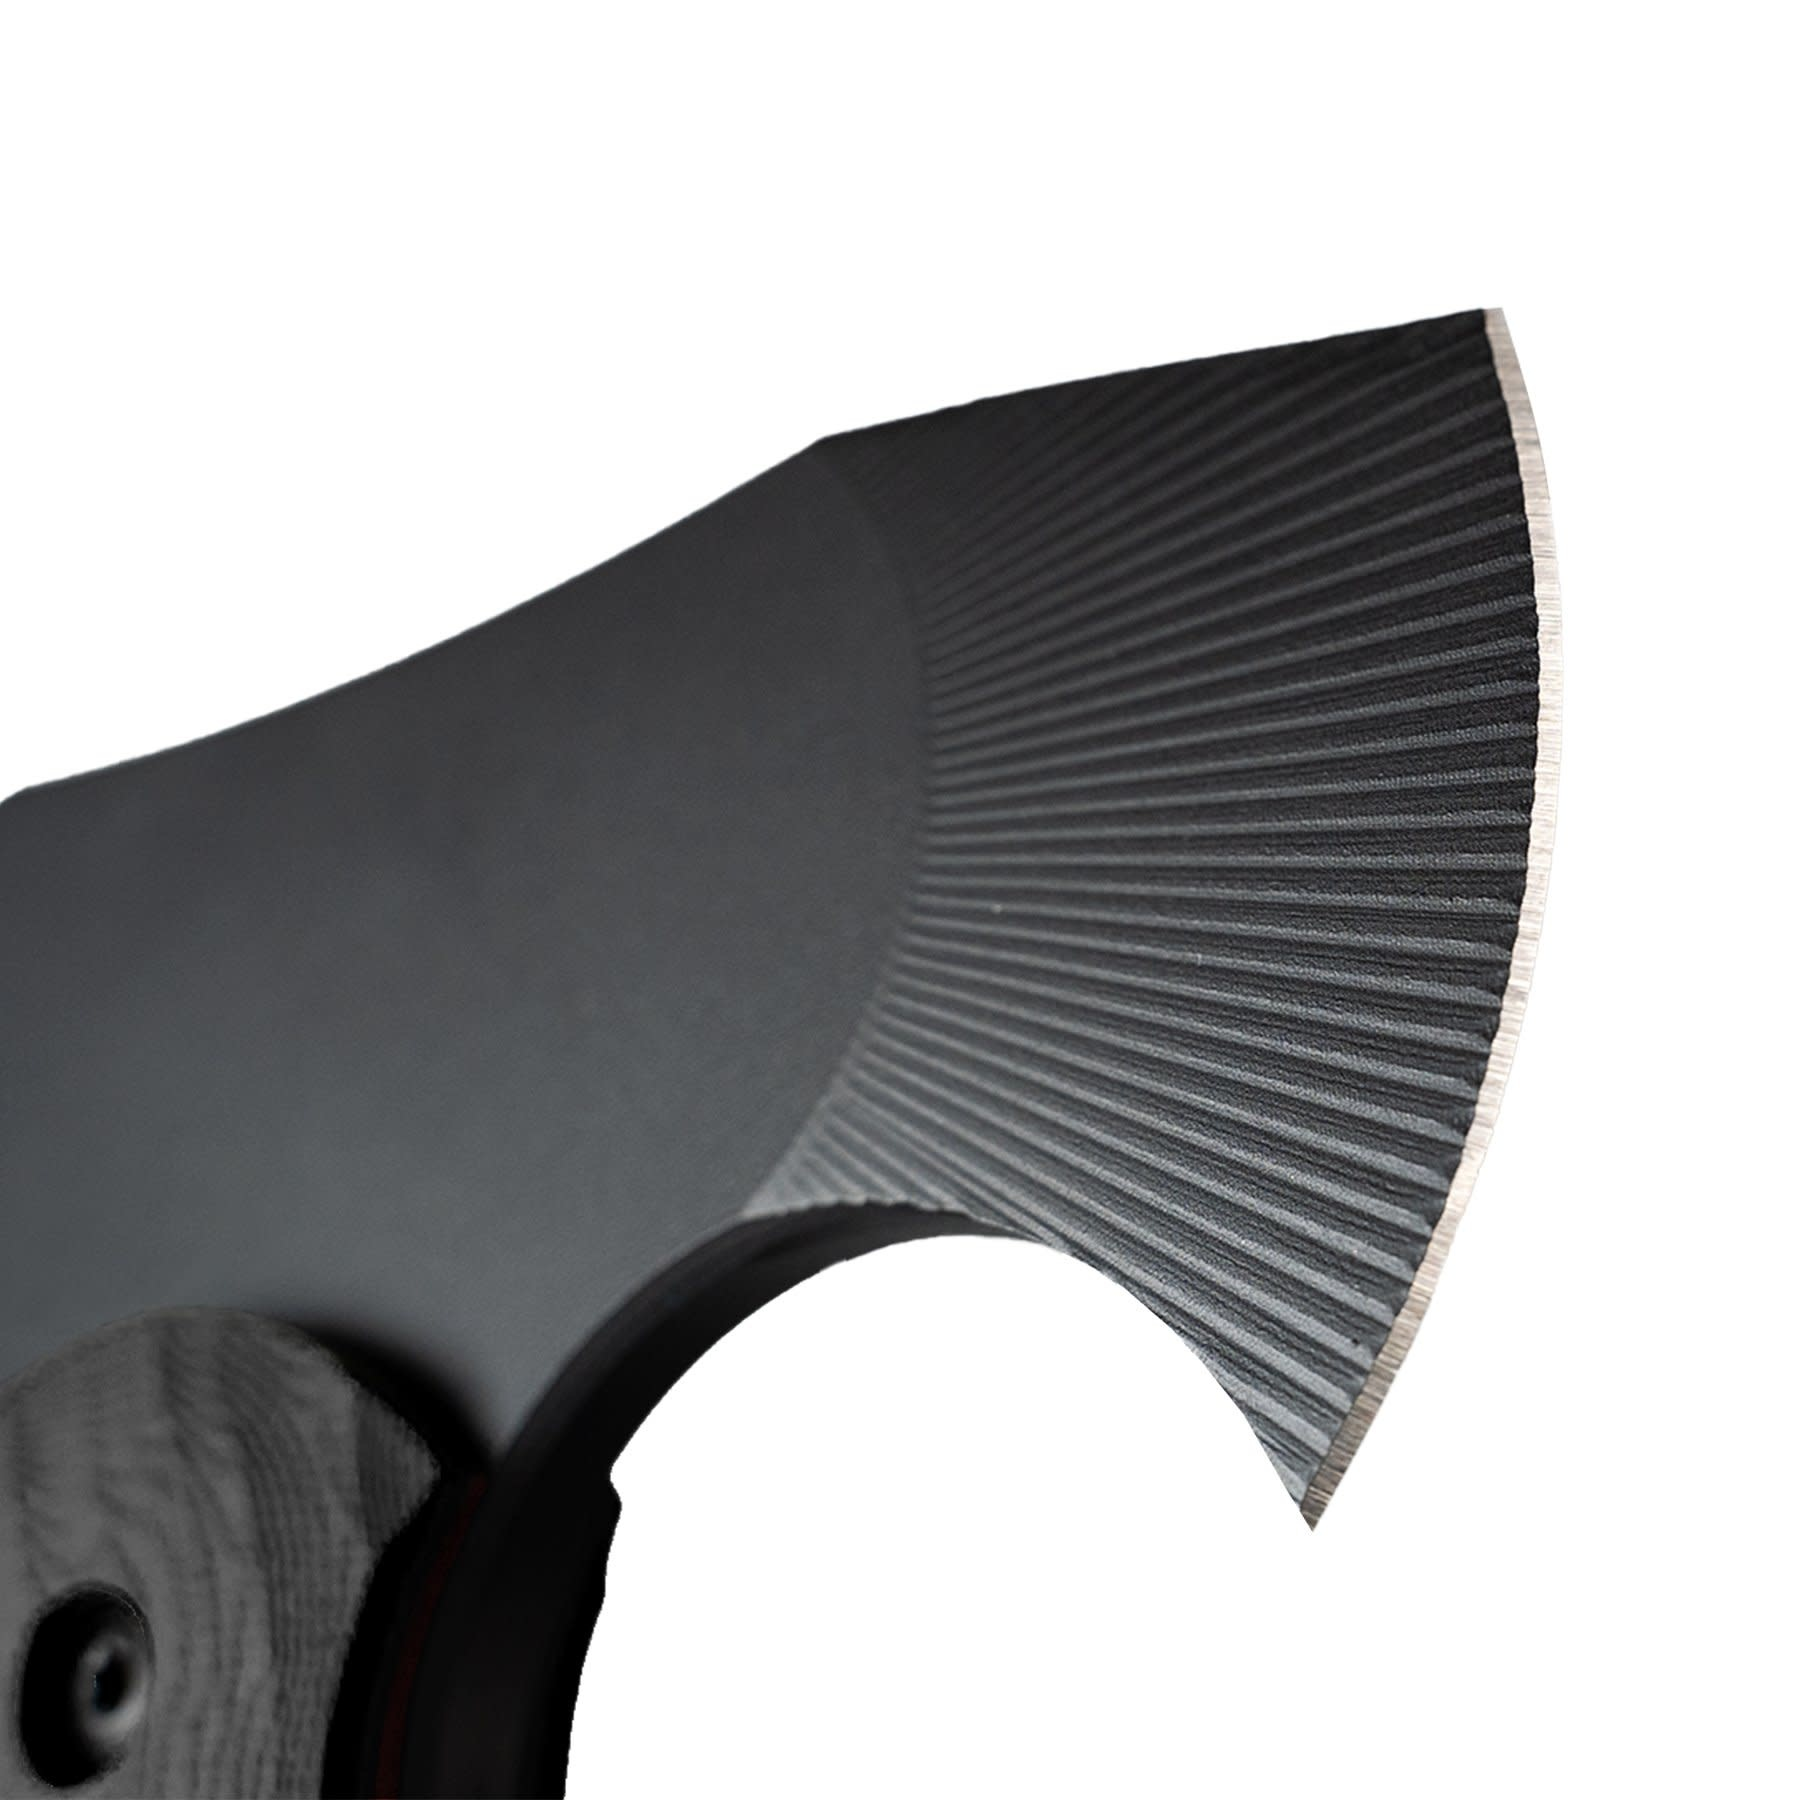 Toor Knives Tomahawk - Shadow Black